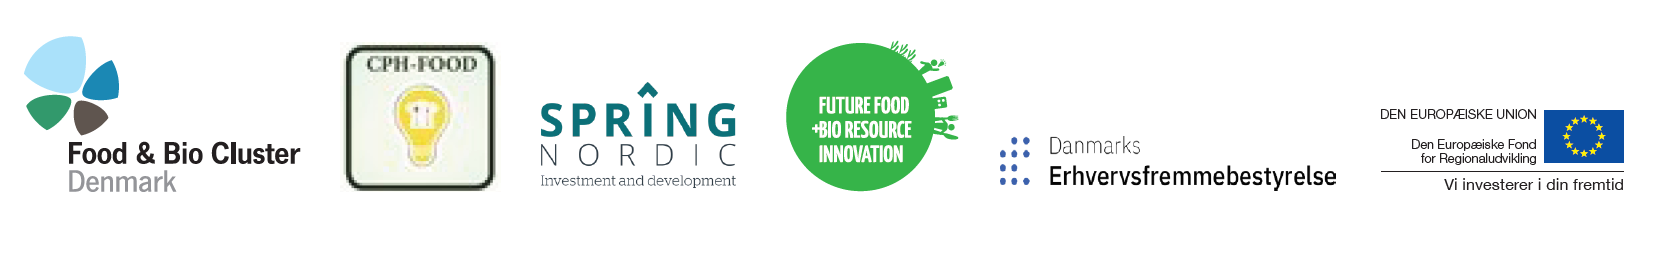 Dynamikker i offentlige udbud (CPH Food / FFBI)